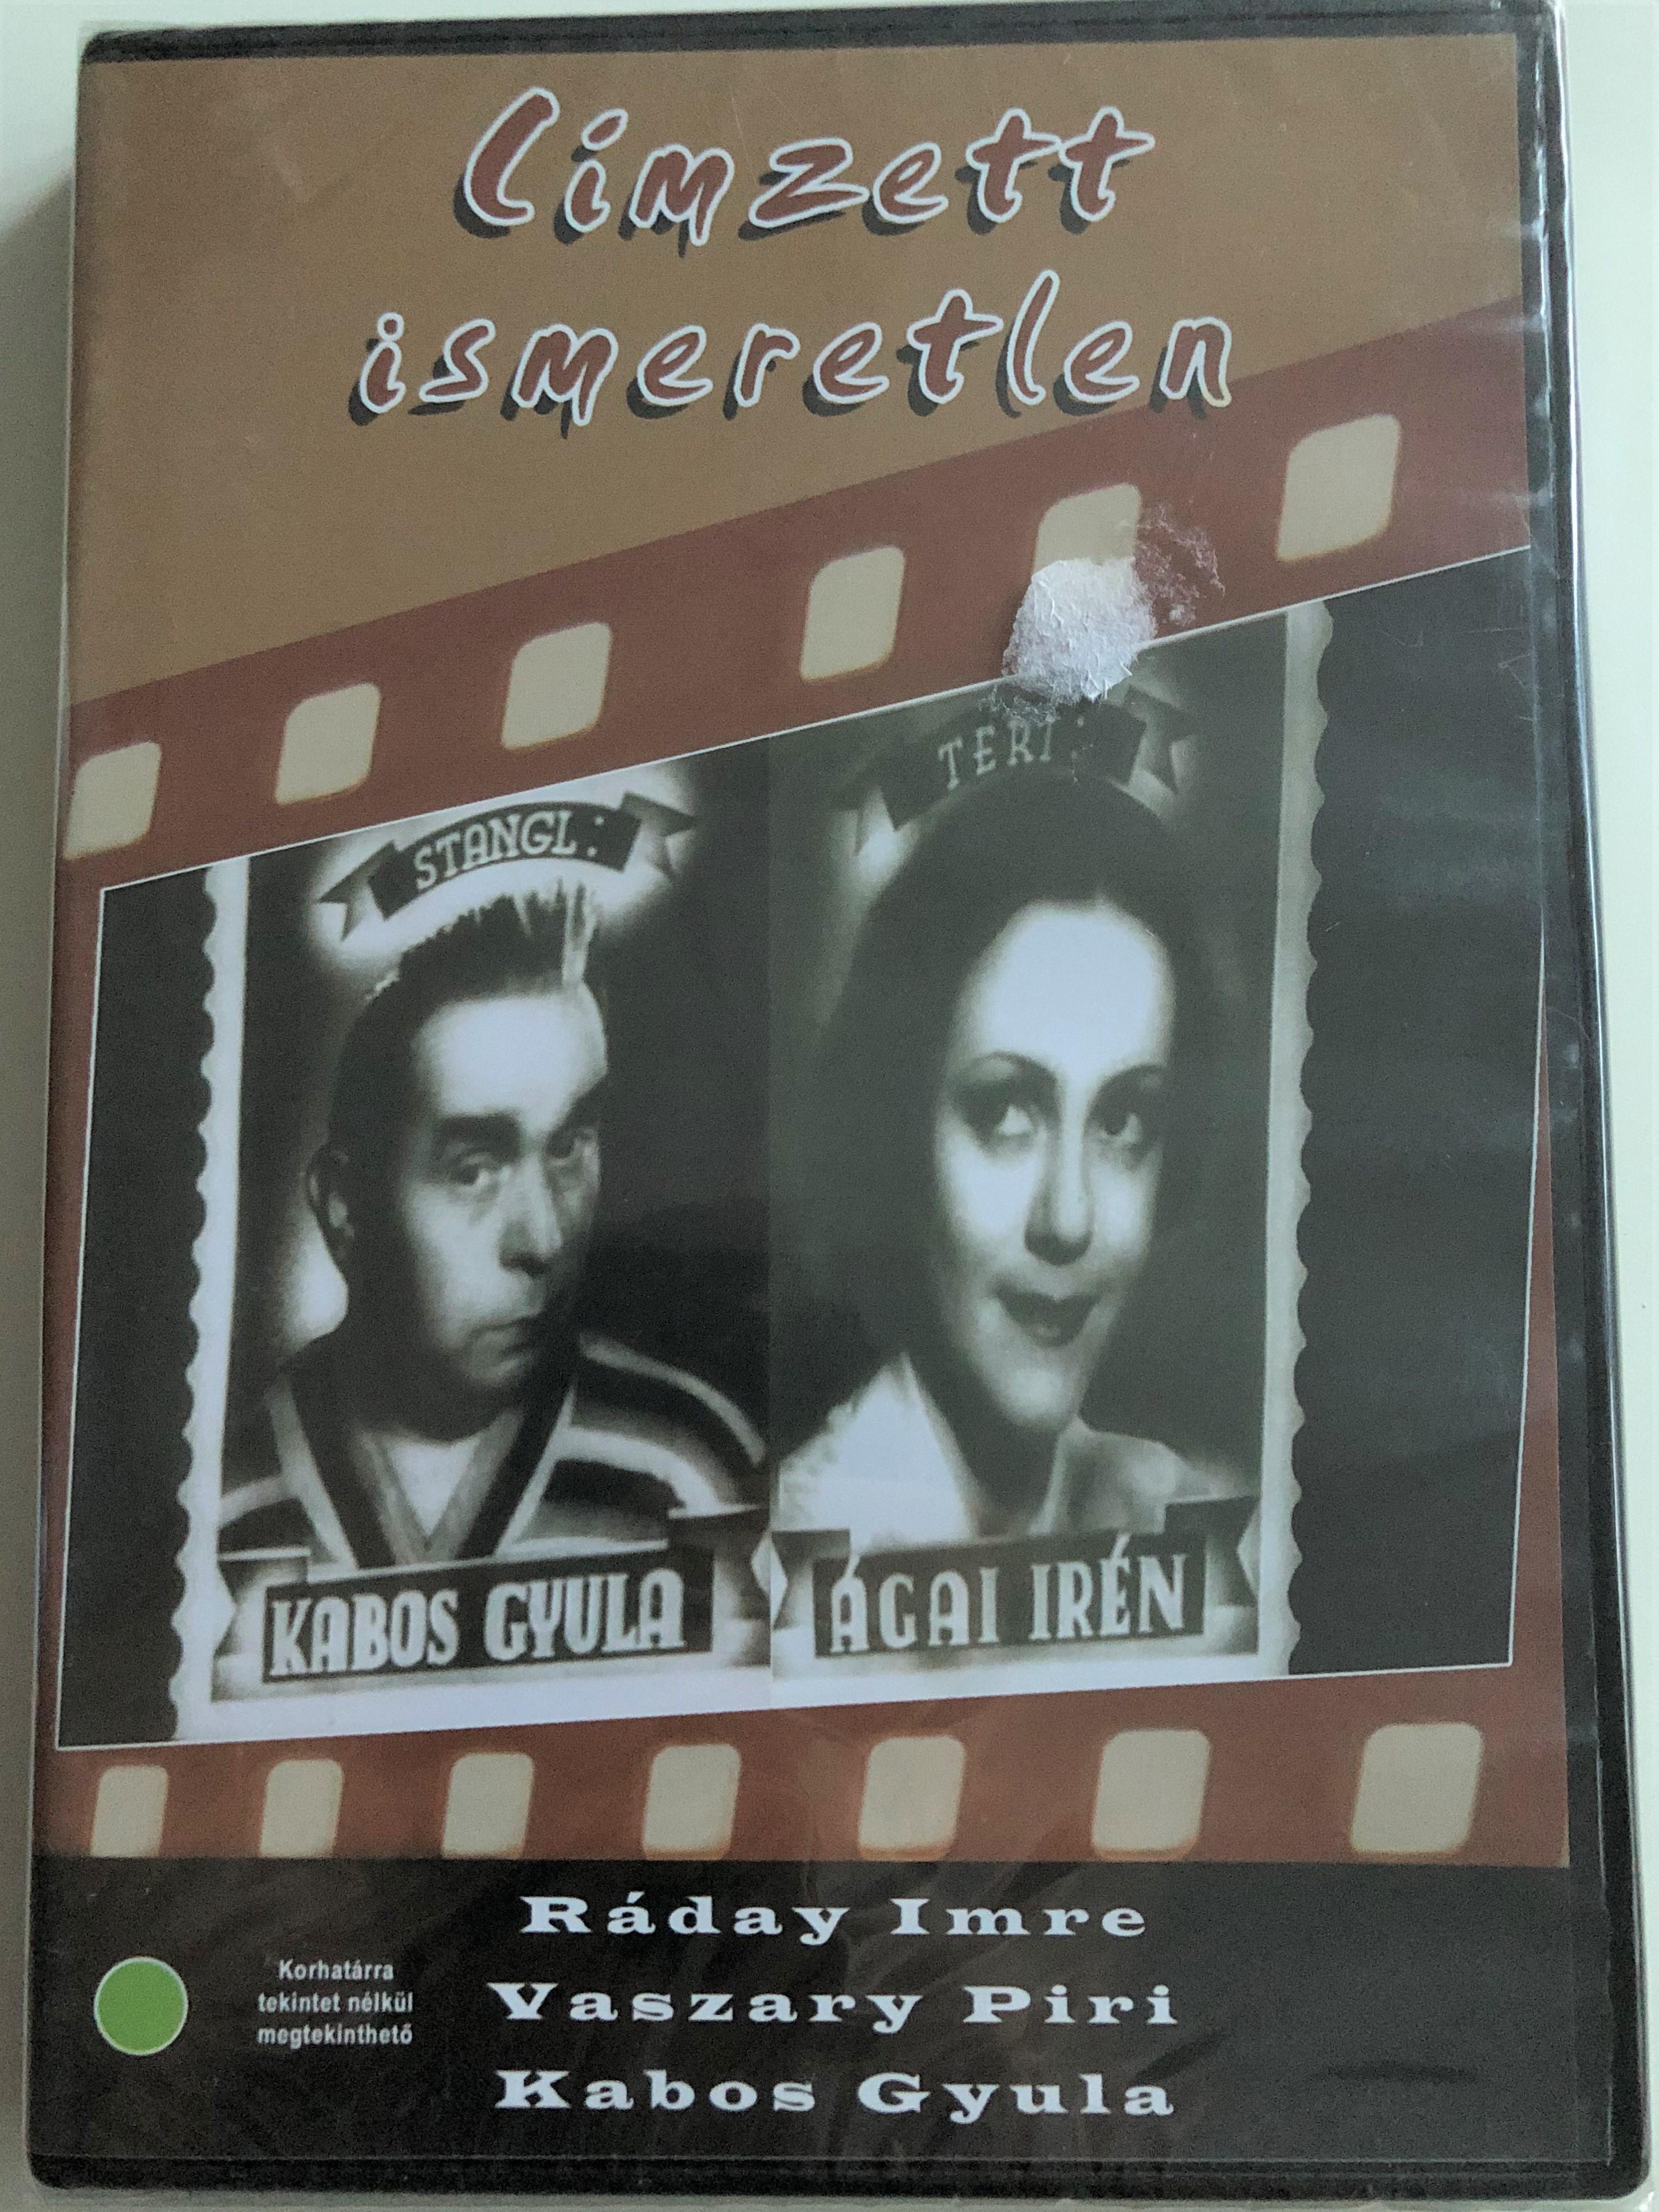 recipient-unknown-dvd-1935-c-mzett-ismeretlen-directed-by-ga-l-b-la-starring-kabos-gyula-r-day-imre-gay-ir-n-hungarian-b-w-classic-1-.jpg